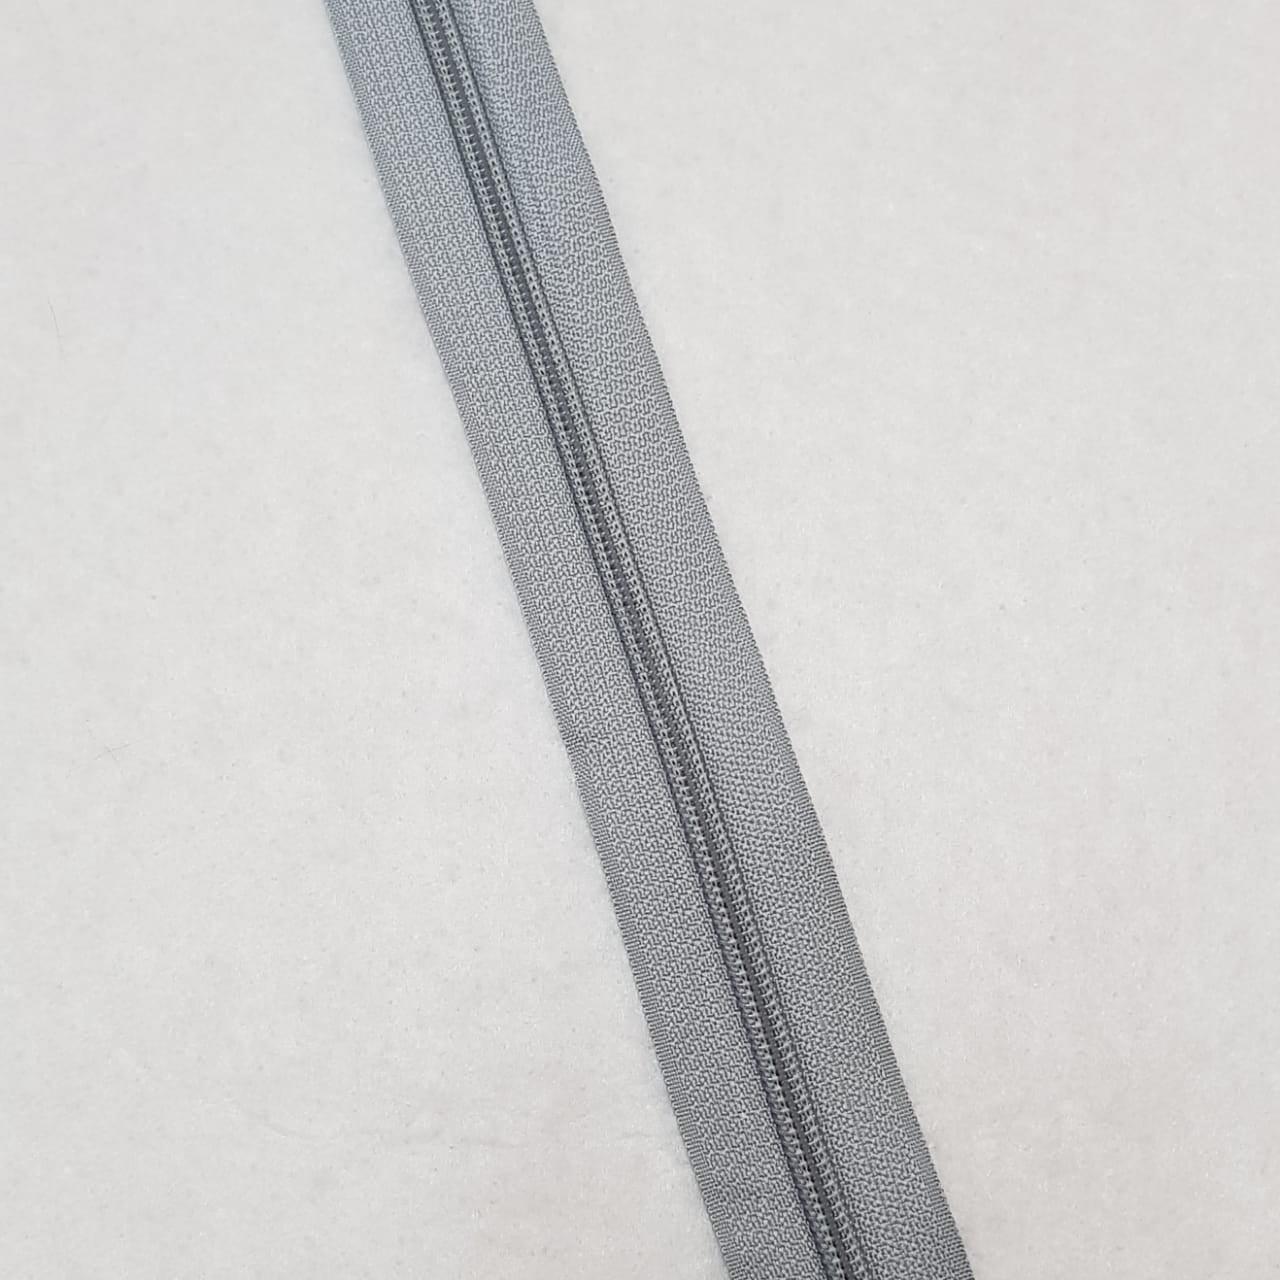 Zíper - ZR - 5mm - Cinza claro